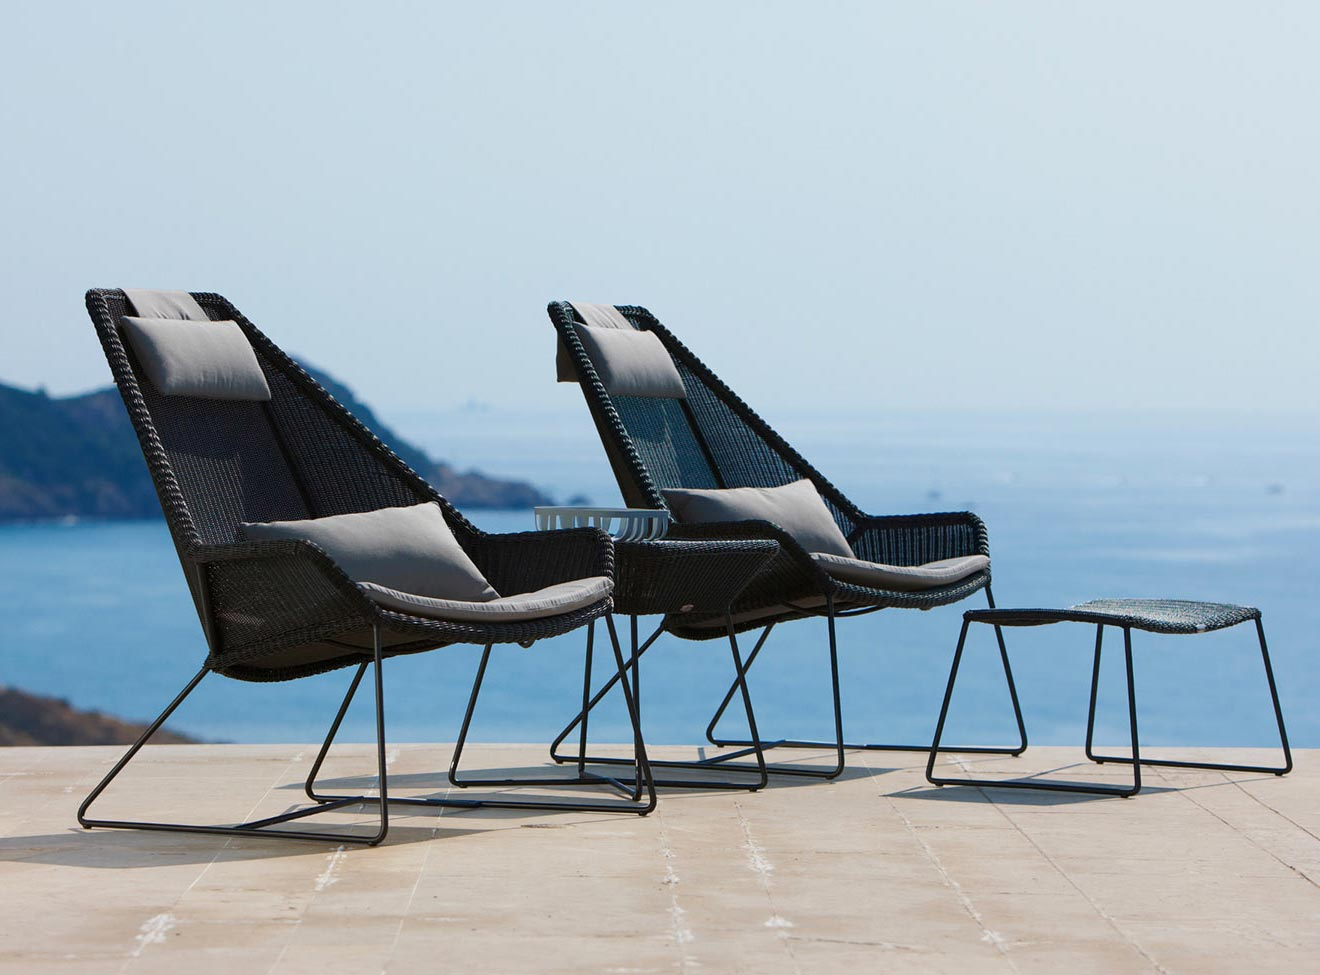 Breeze highback fåtöljer i svart konstrotting från Cane-line.